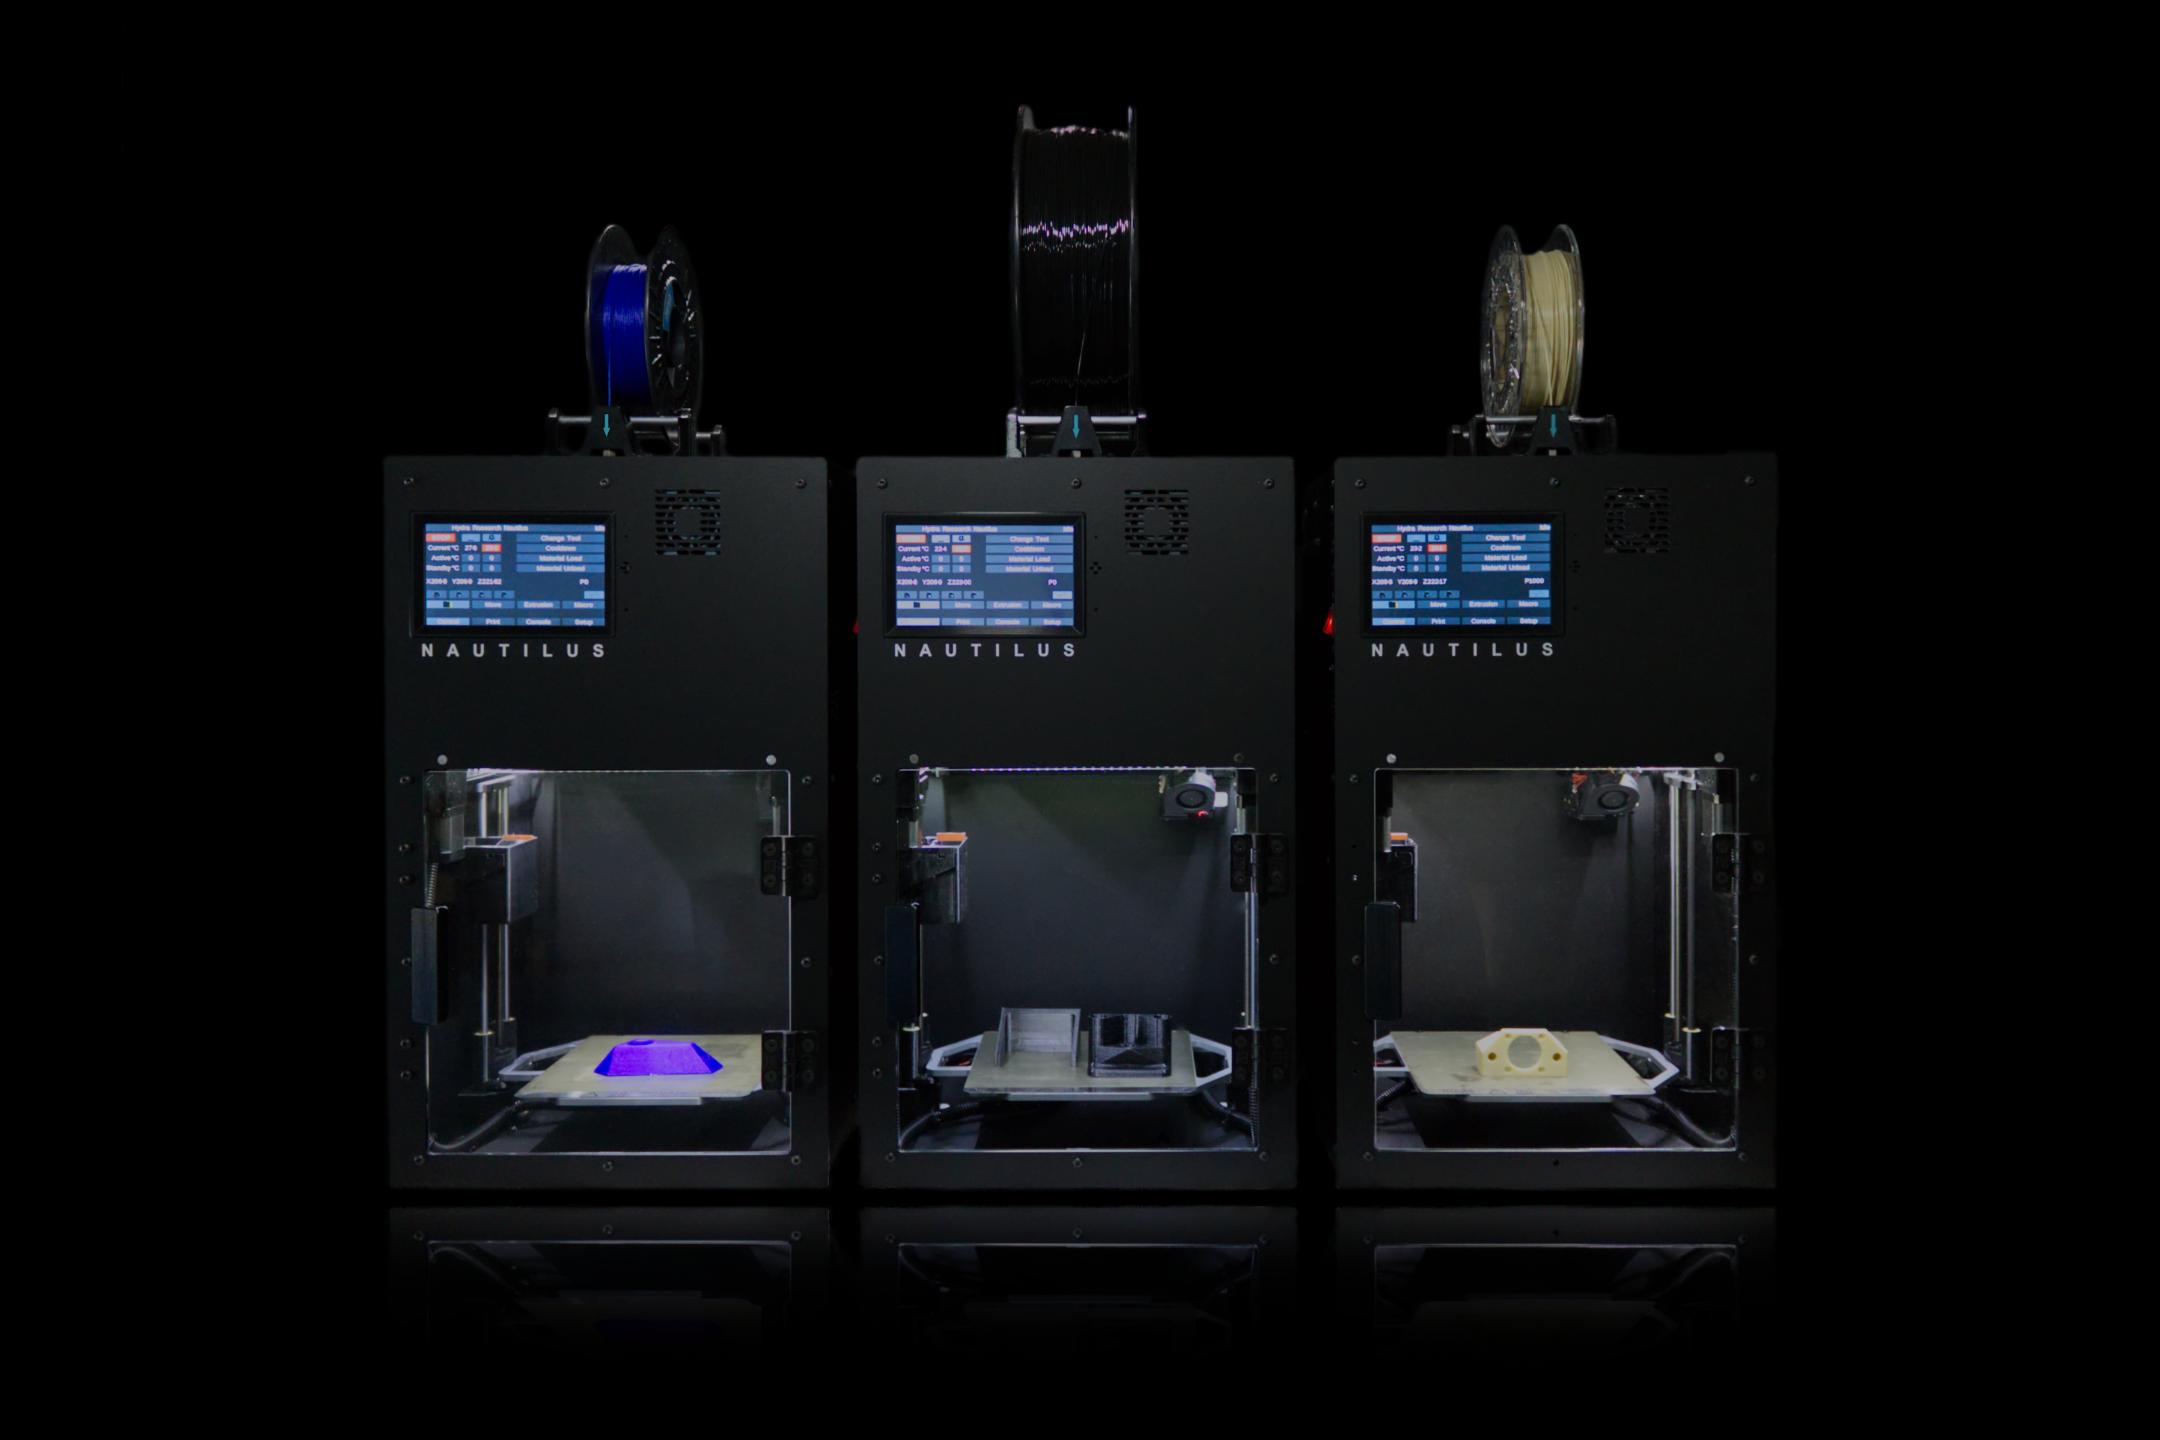 Three Nautilus 3D printers. Image via Hydra Research.